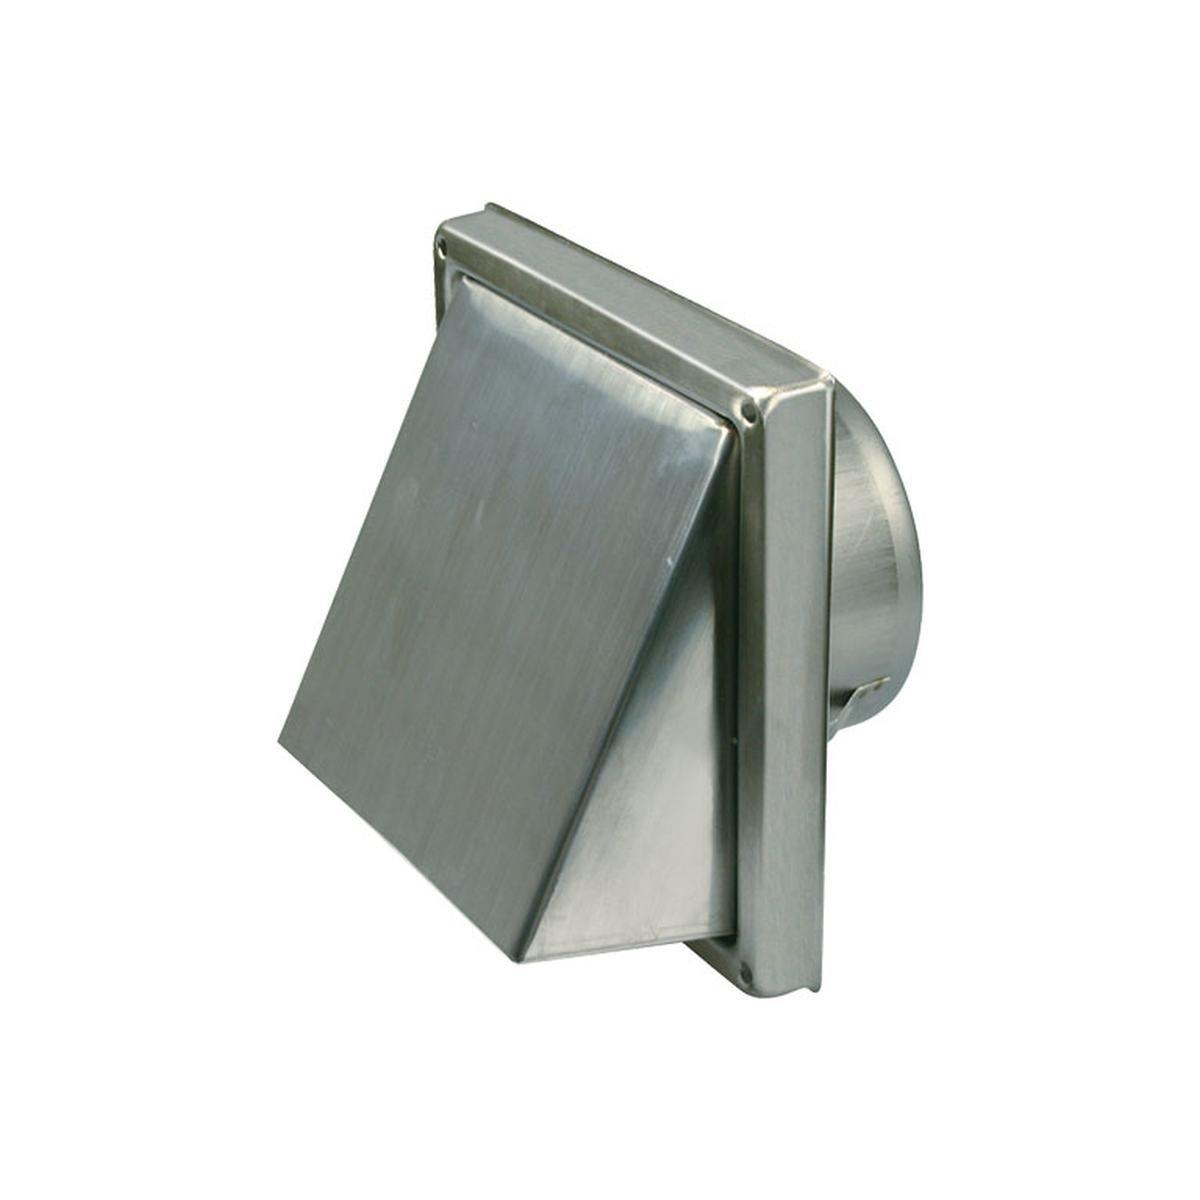 Klapventil Ø150 mm. rustfri stål